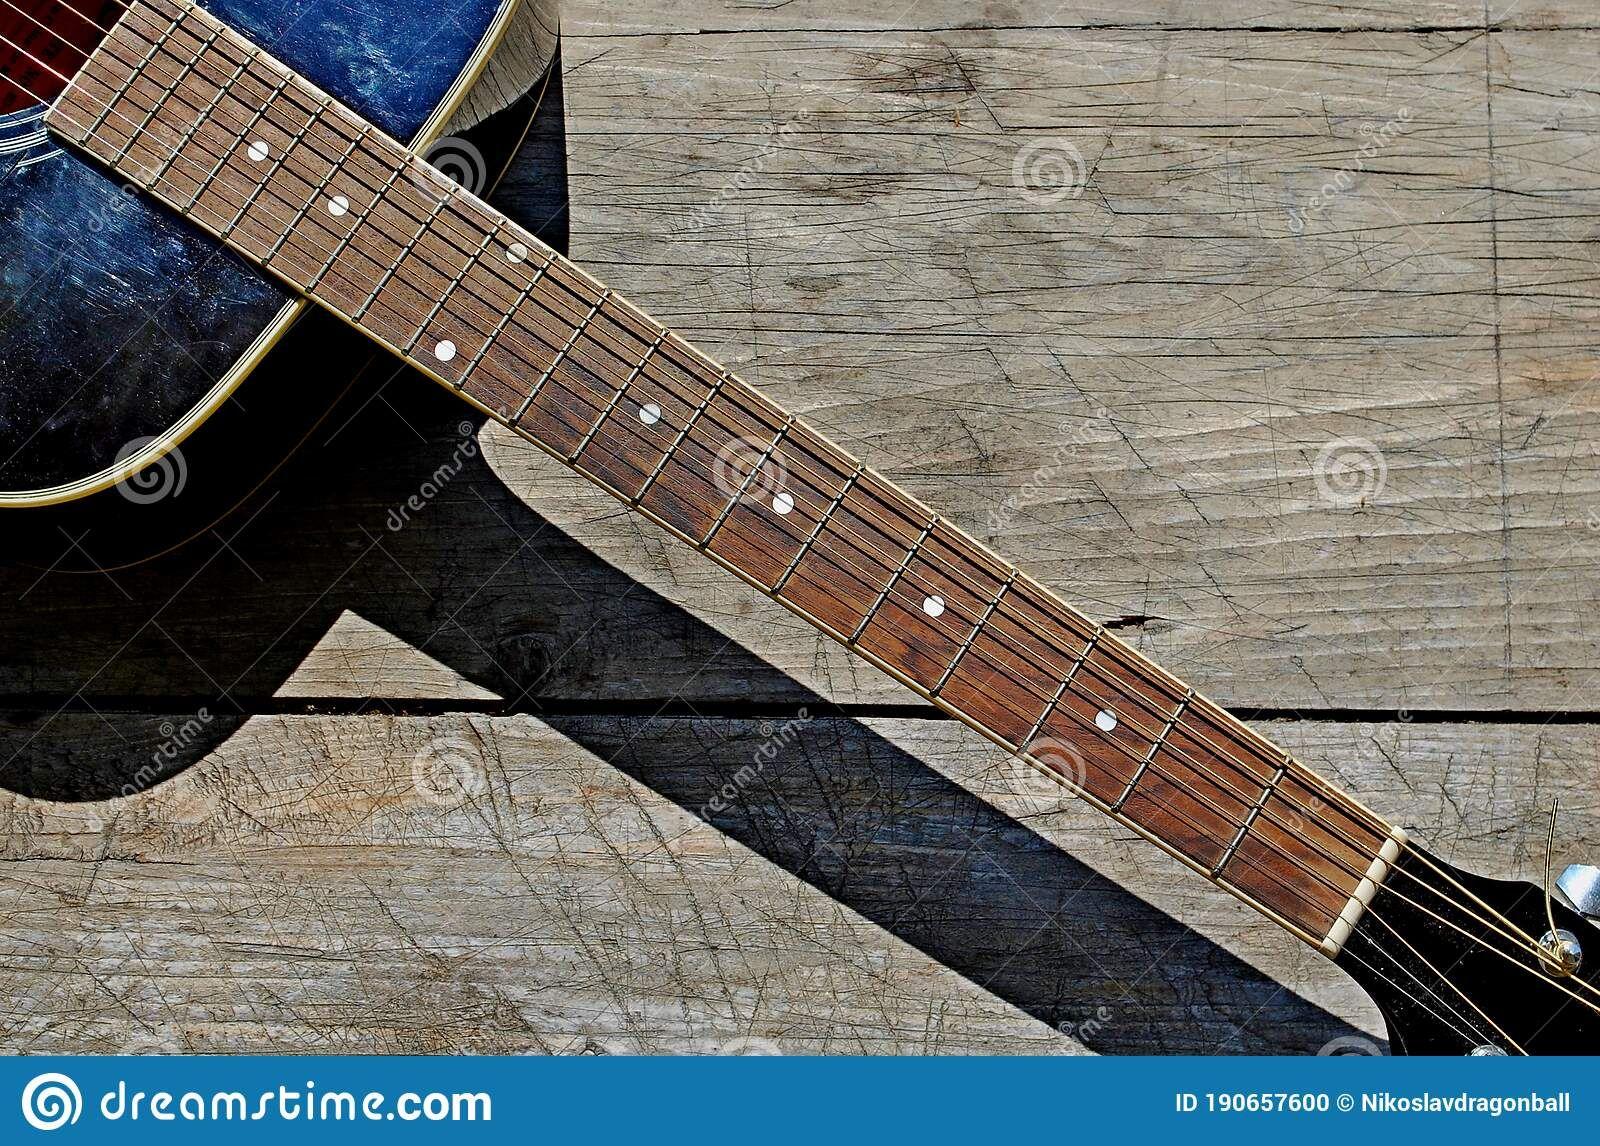 Pin By Nikola Milosev On Guitars Guitar Guitar Neck Acoustic Guitar